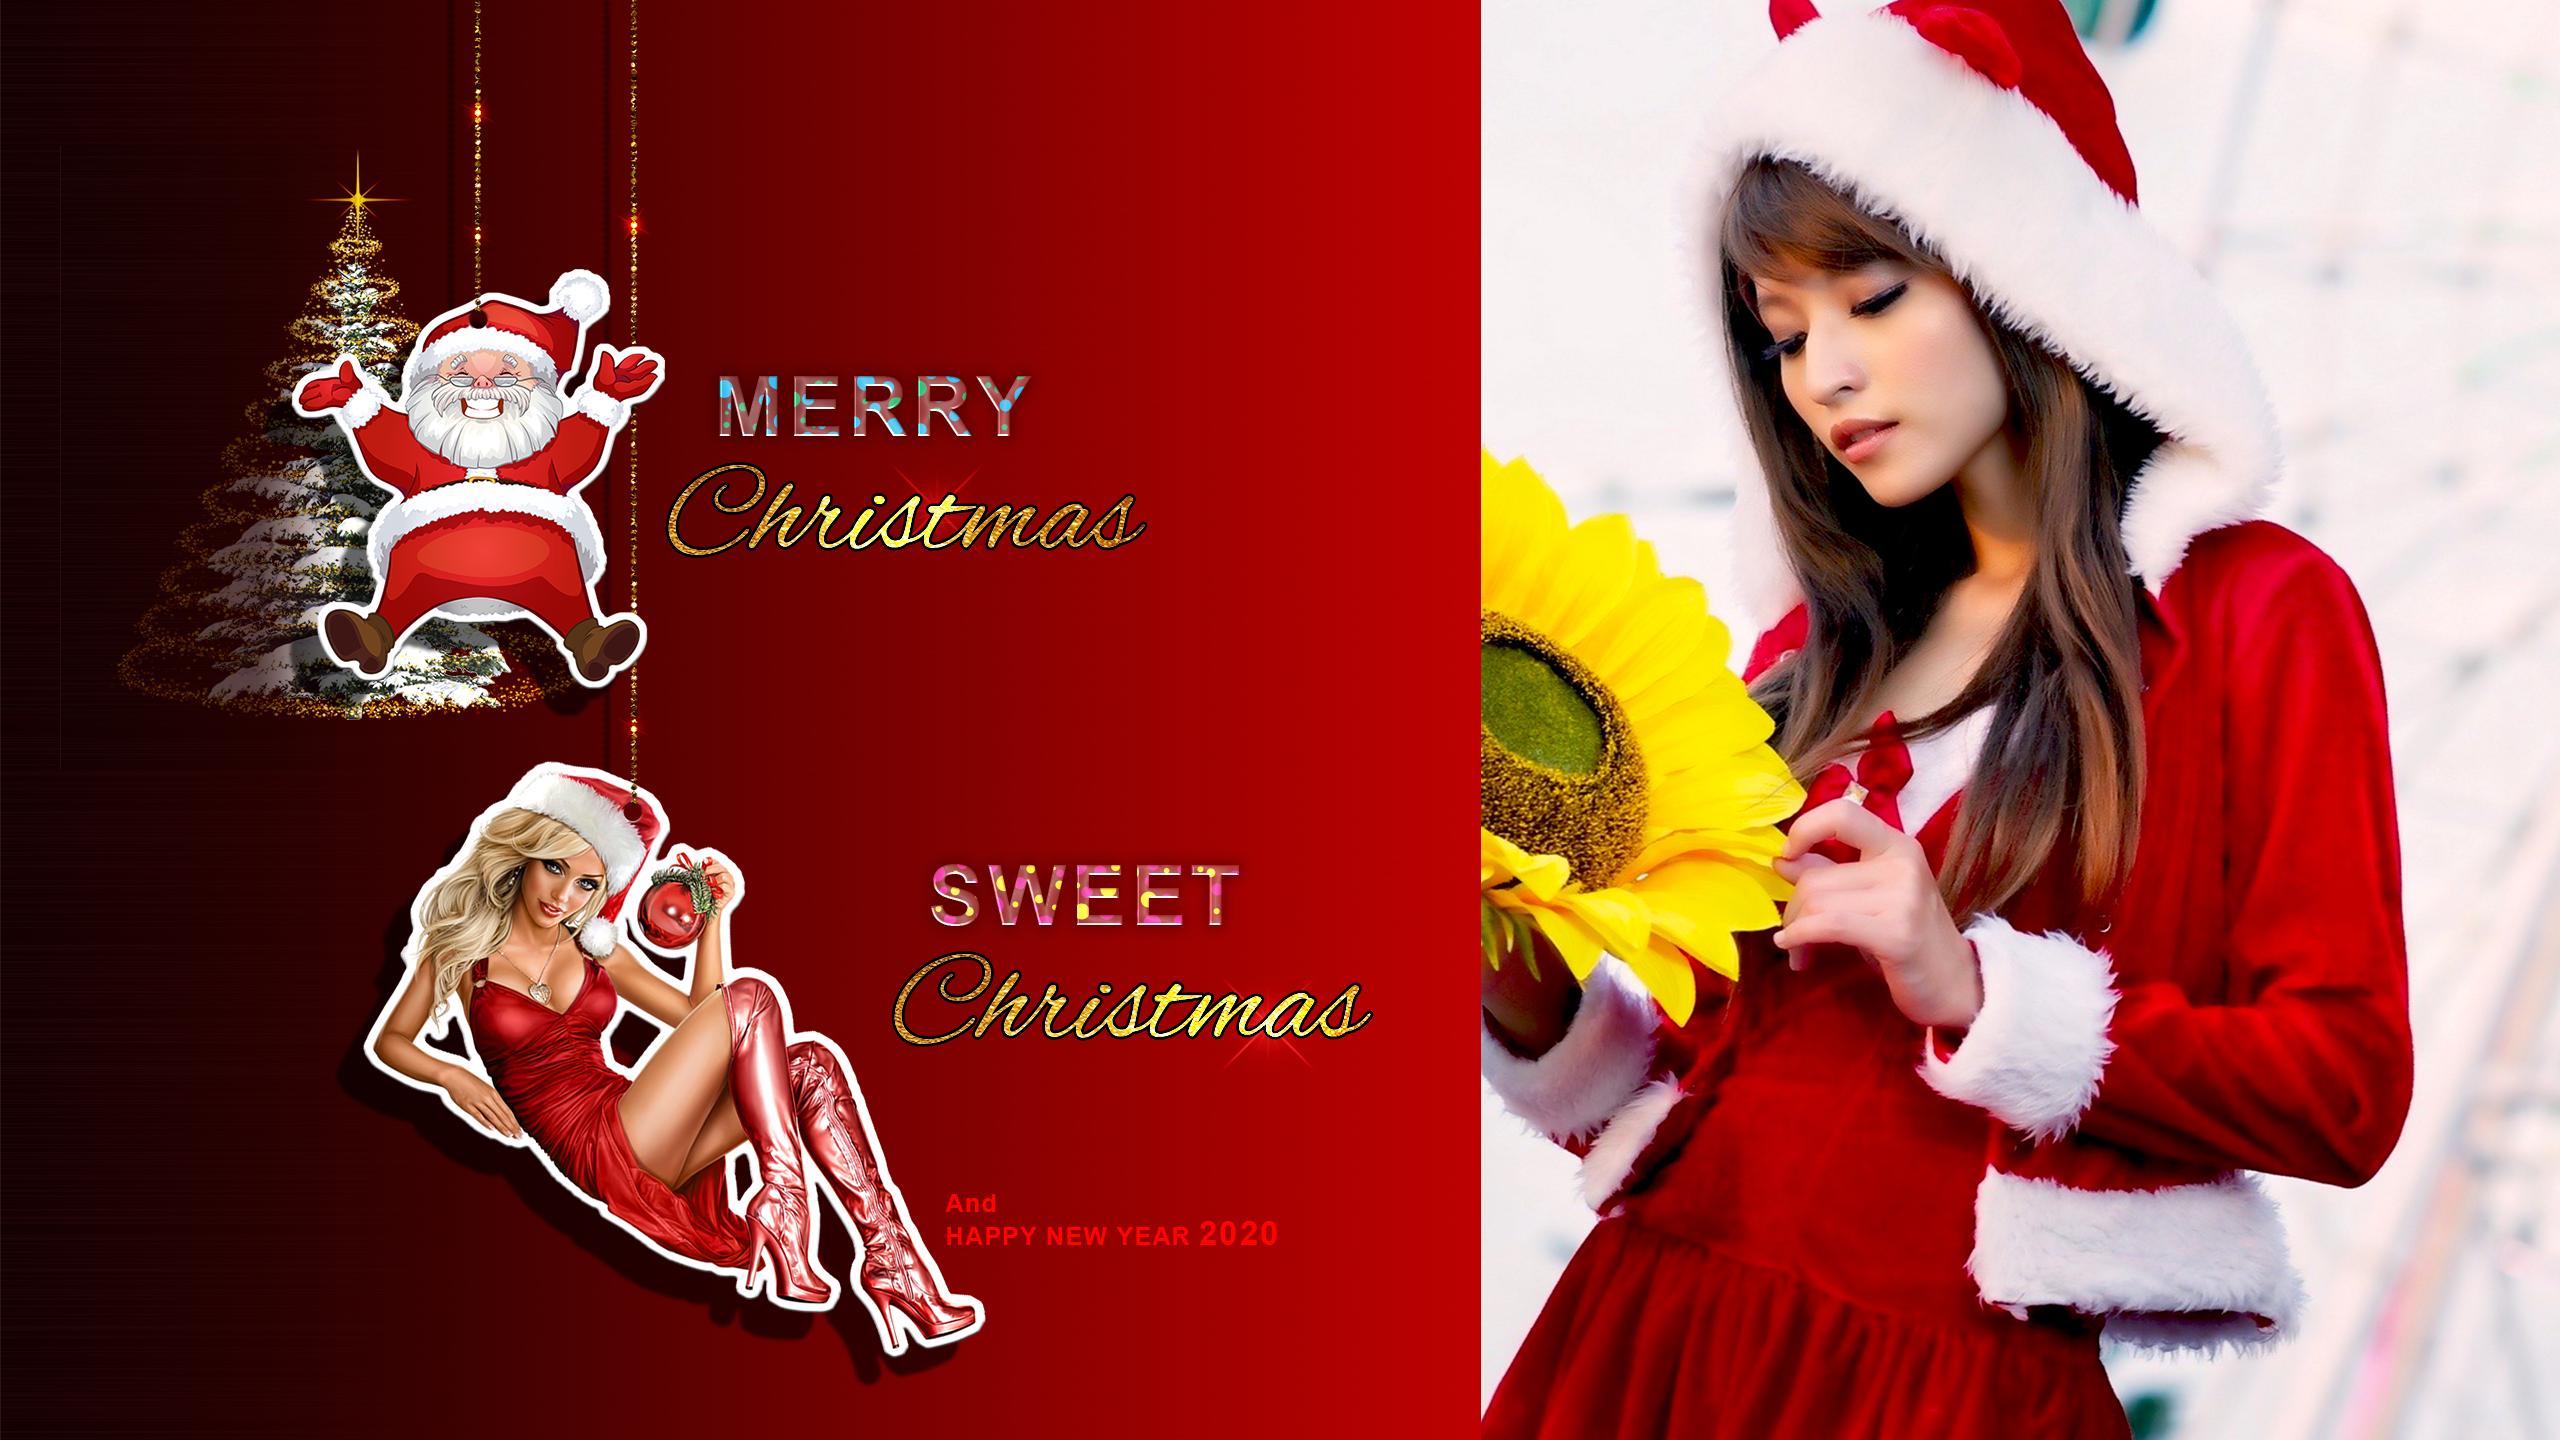 Wallpaper Christmas New Year 2560x1440 Azumi 1714941 Hd Wallpapers Wallhere